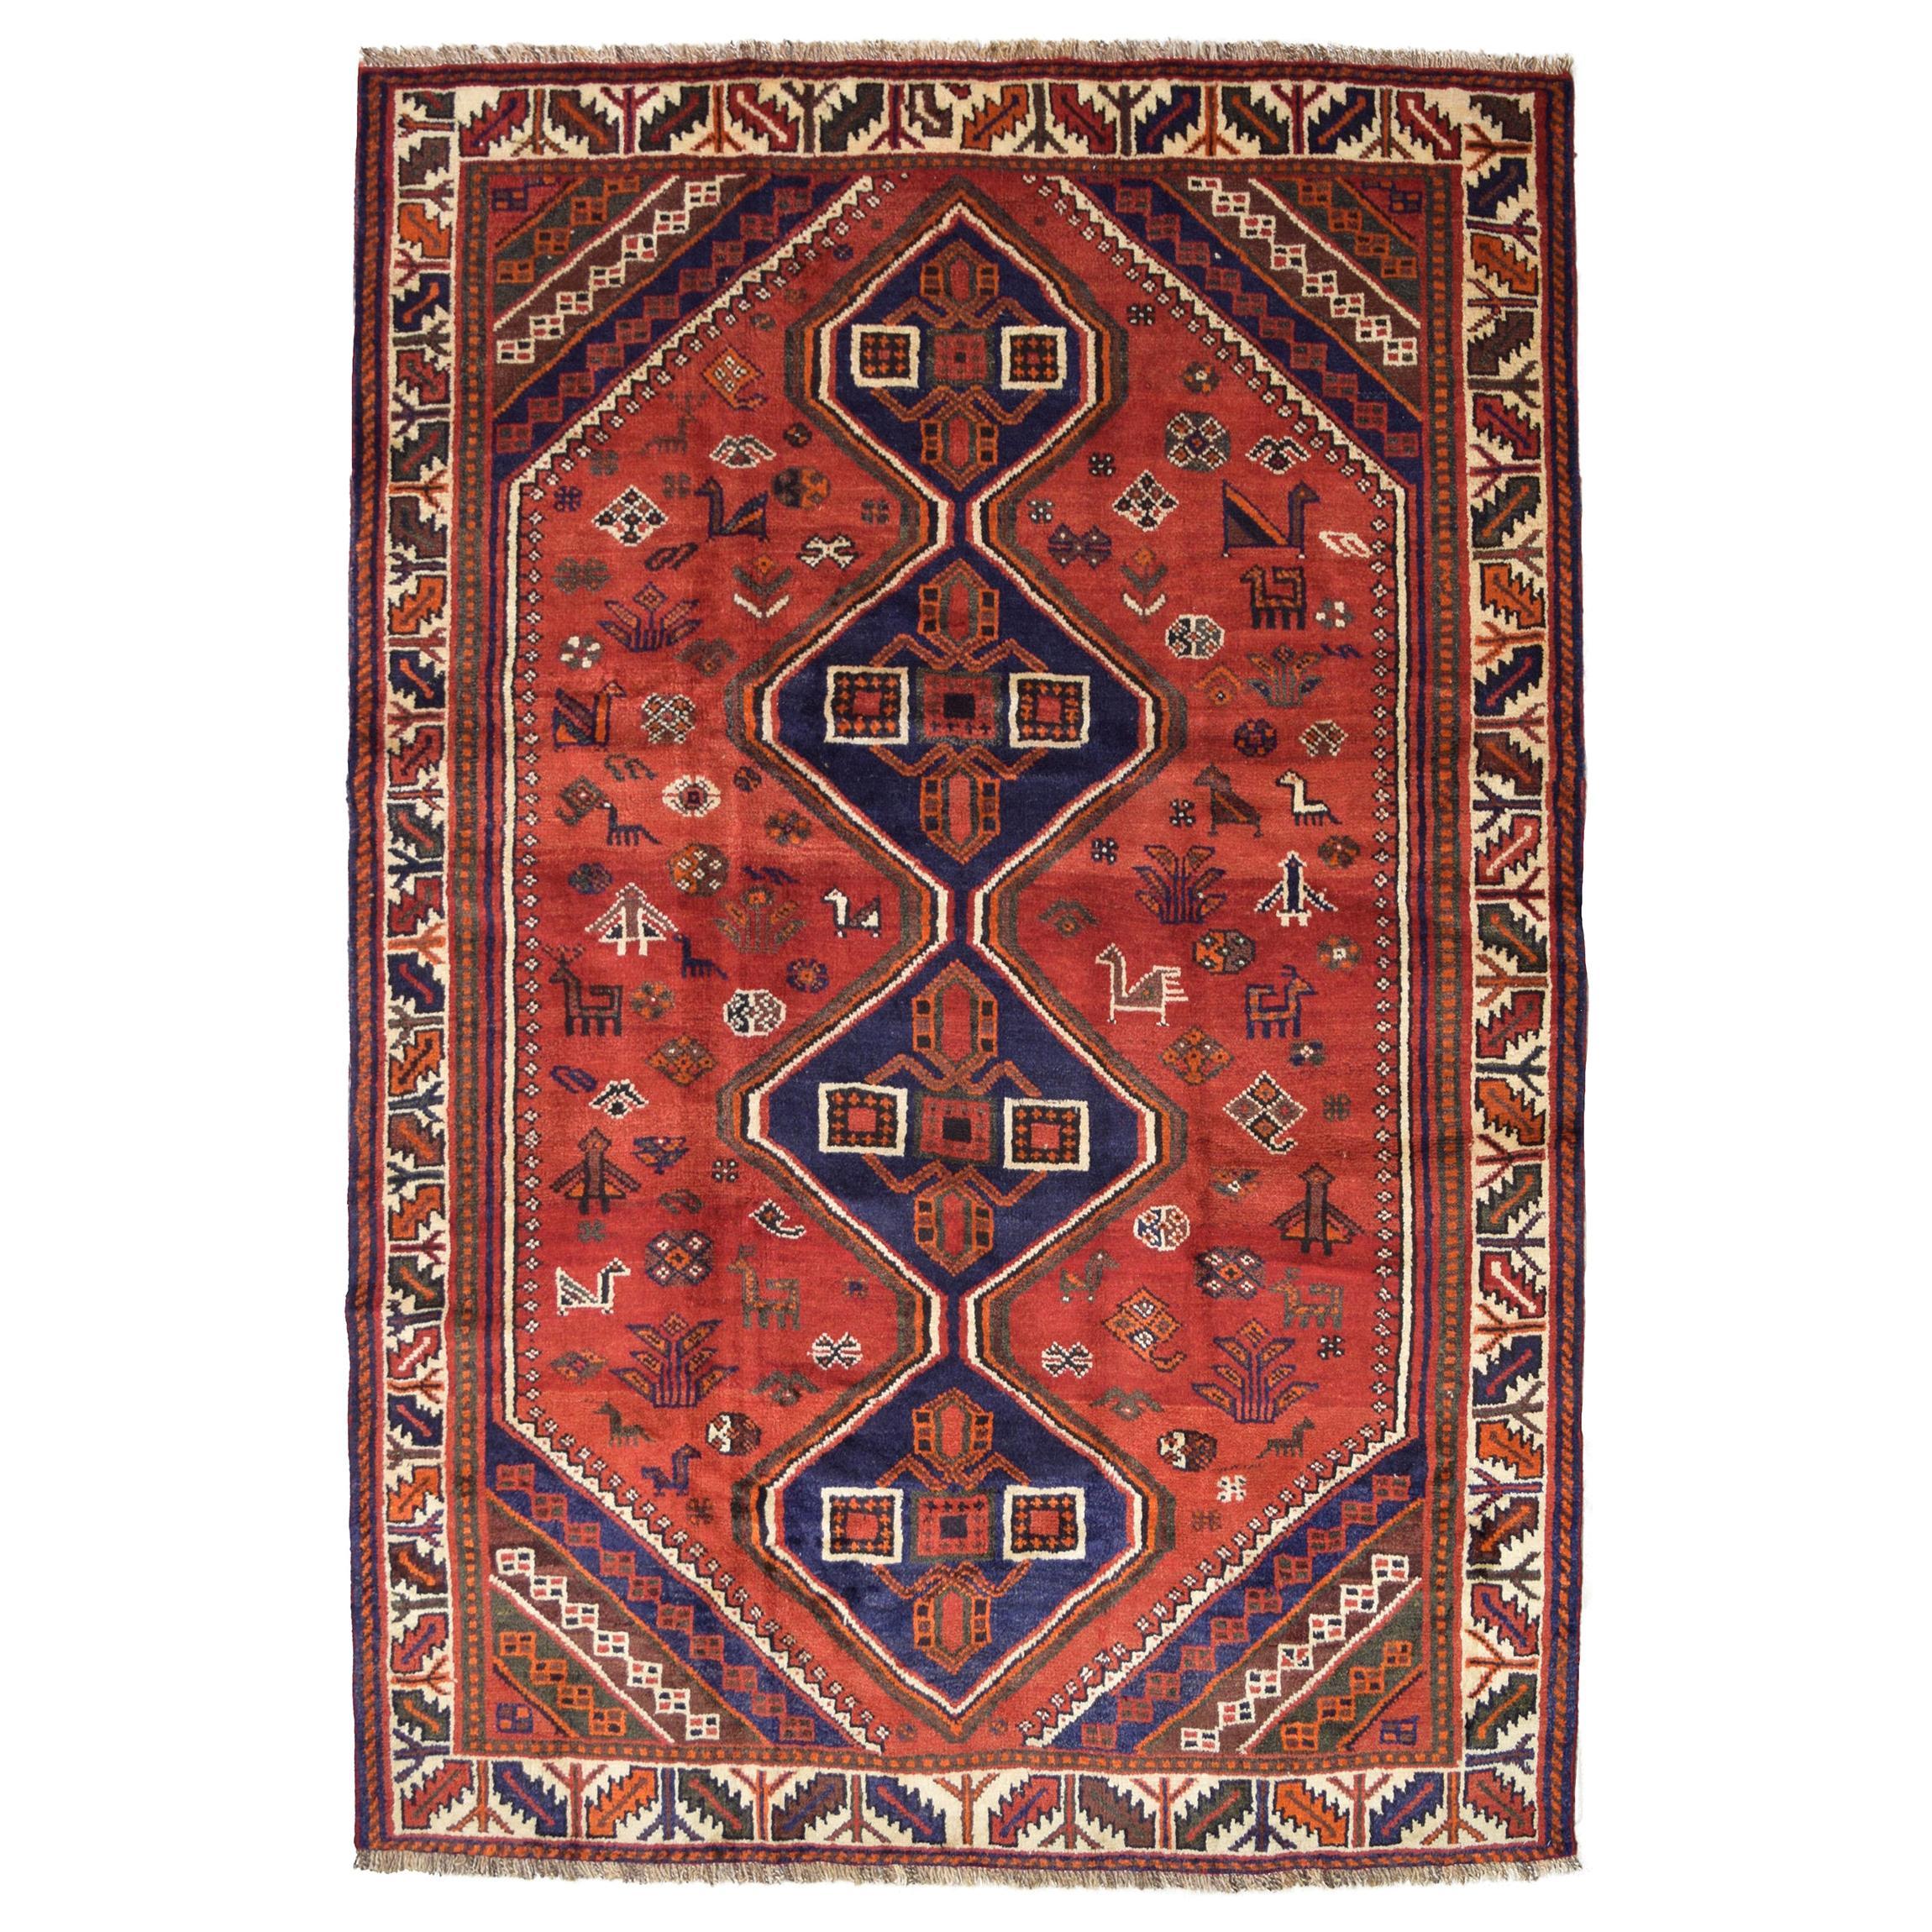 Red, Cream, and Indigo Traditional Persian Ghashghai Carpet